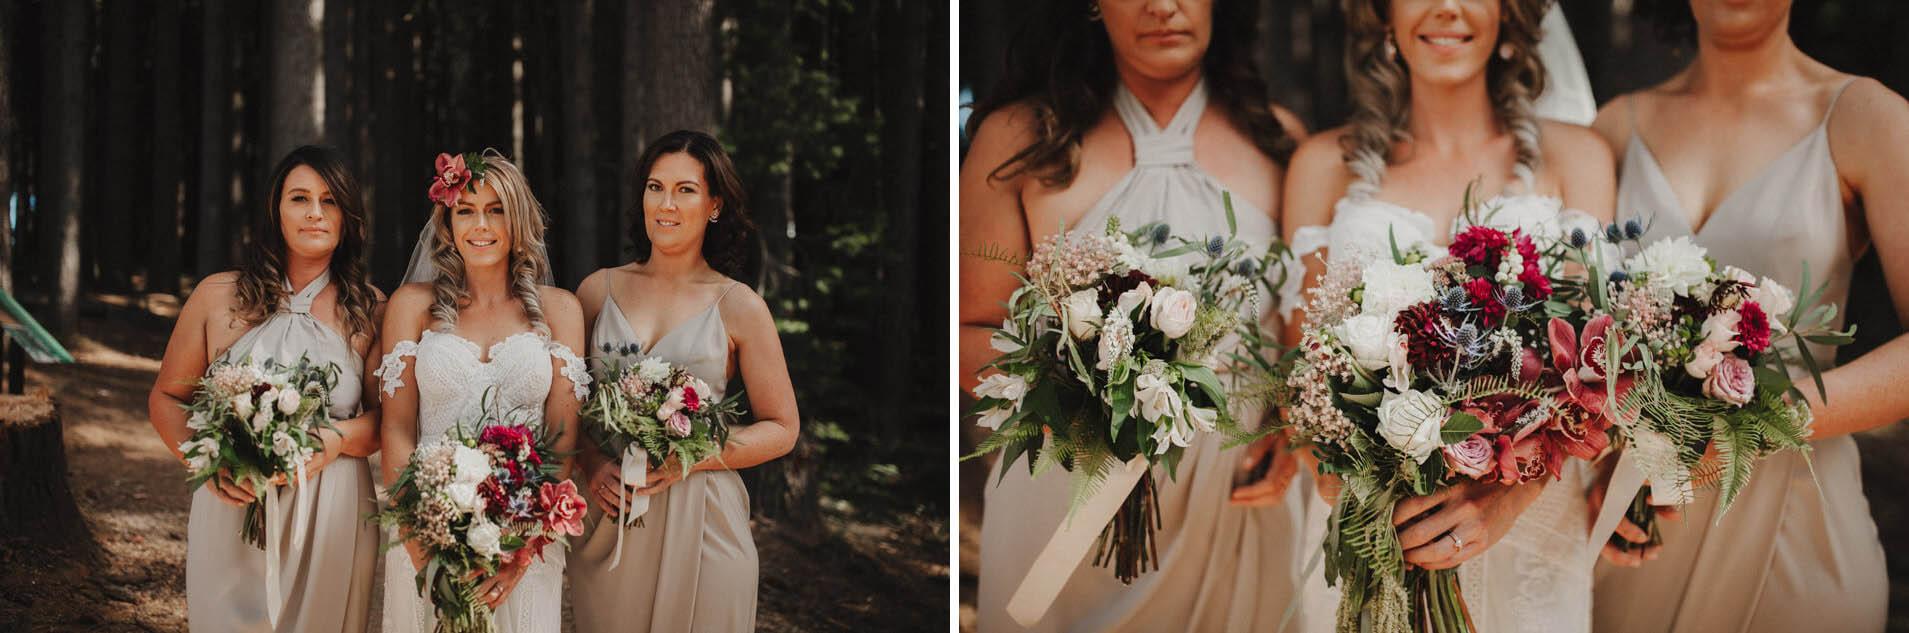 suger-pine-walk-wedding (Corinna & Dylan)_130(2710)2.jpg